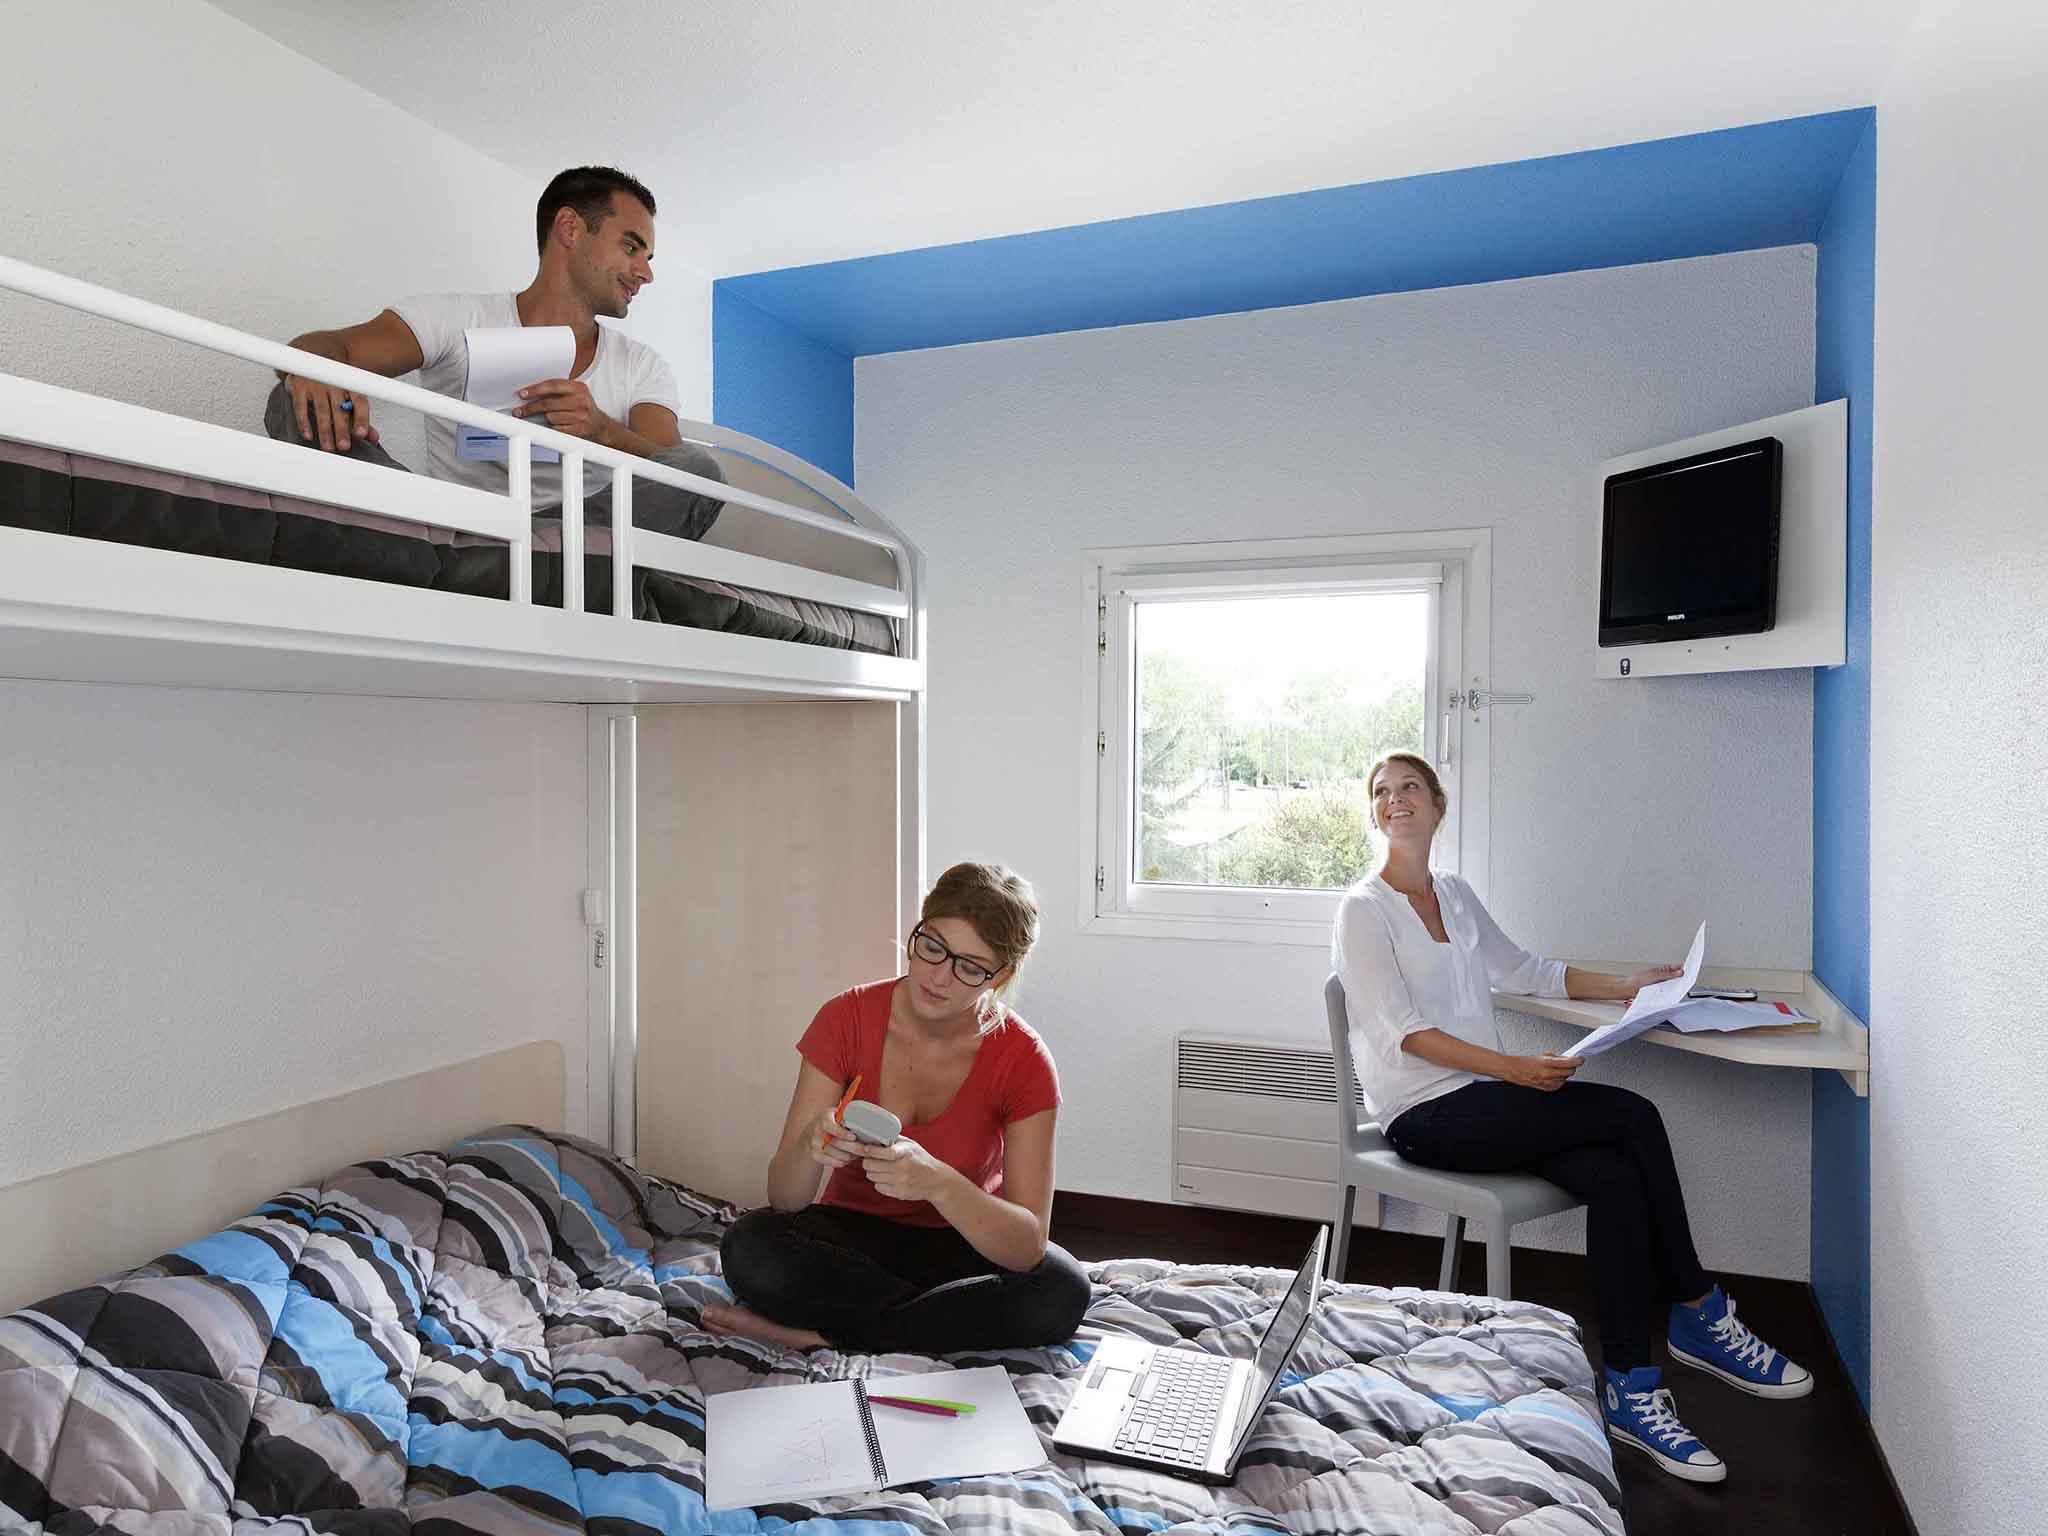 ... Rooms - hotelF1 Charleville Mézières ...